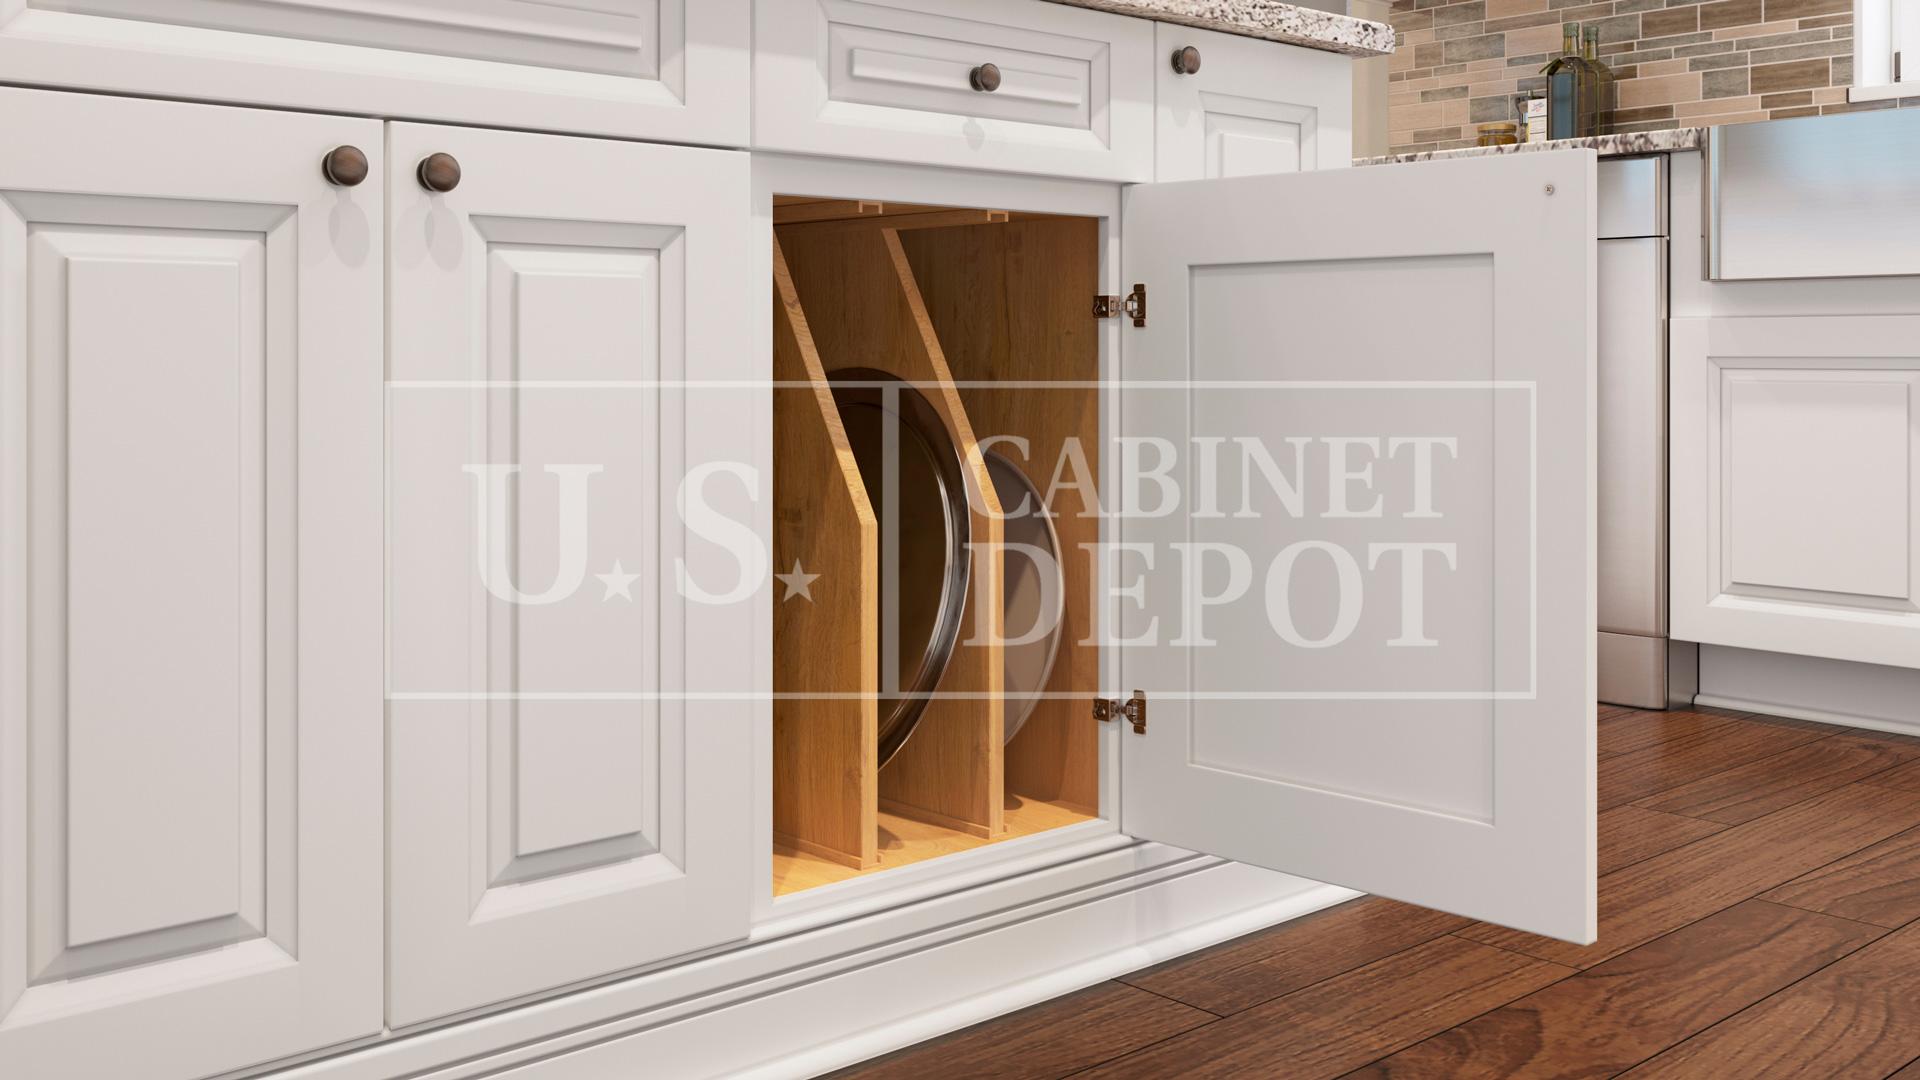 Tahoe White Us Cabinet Depot